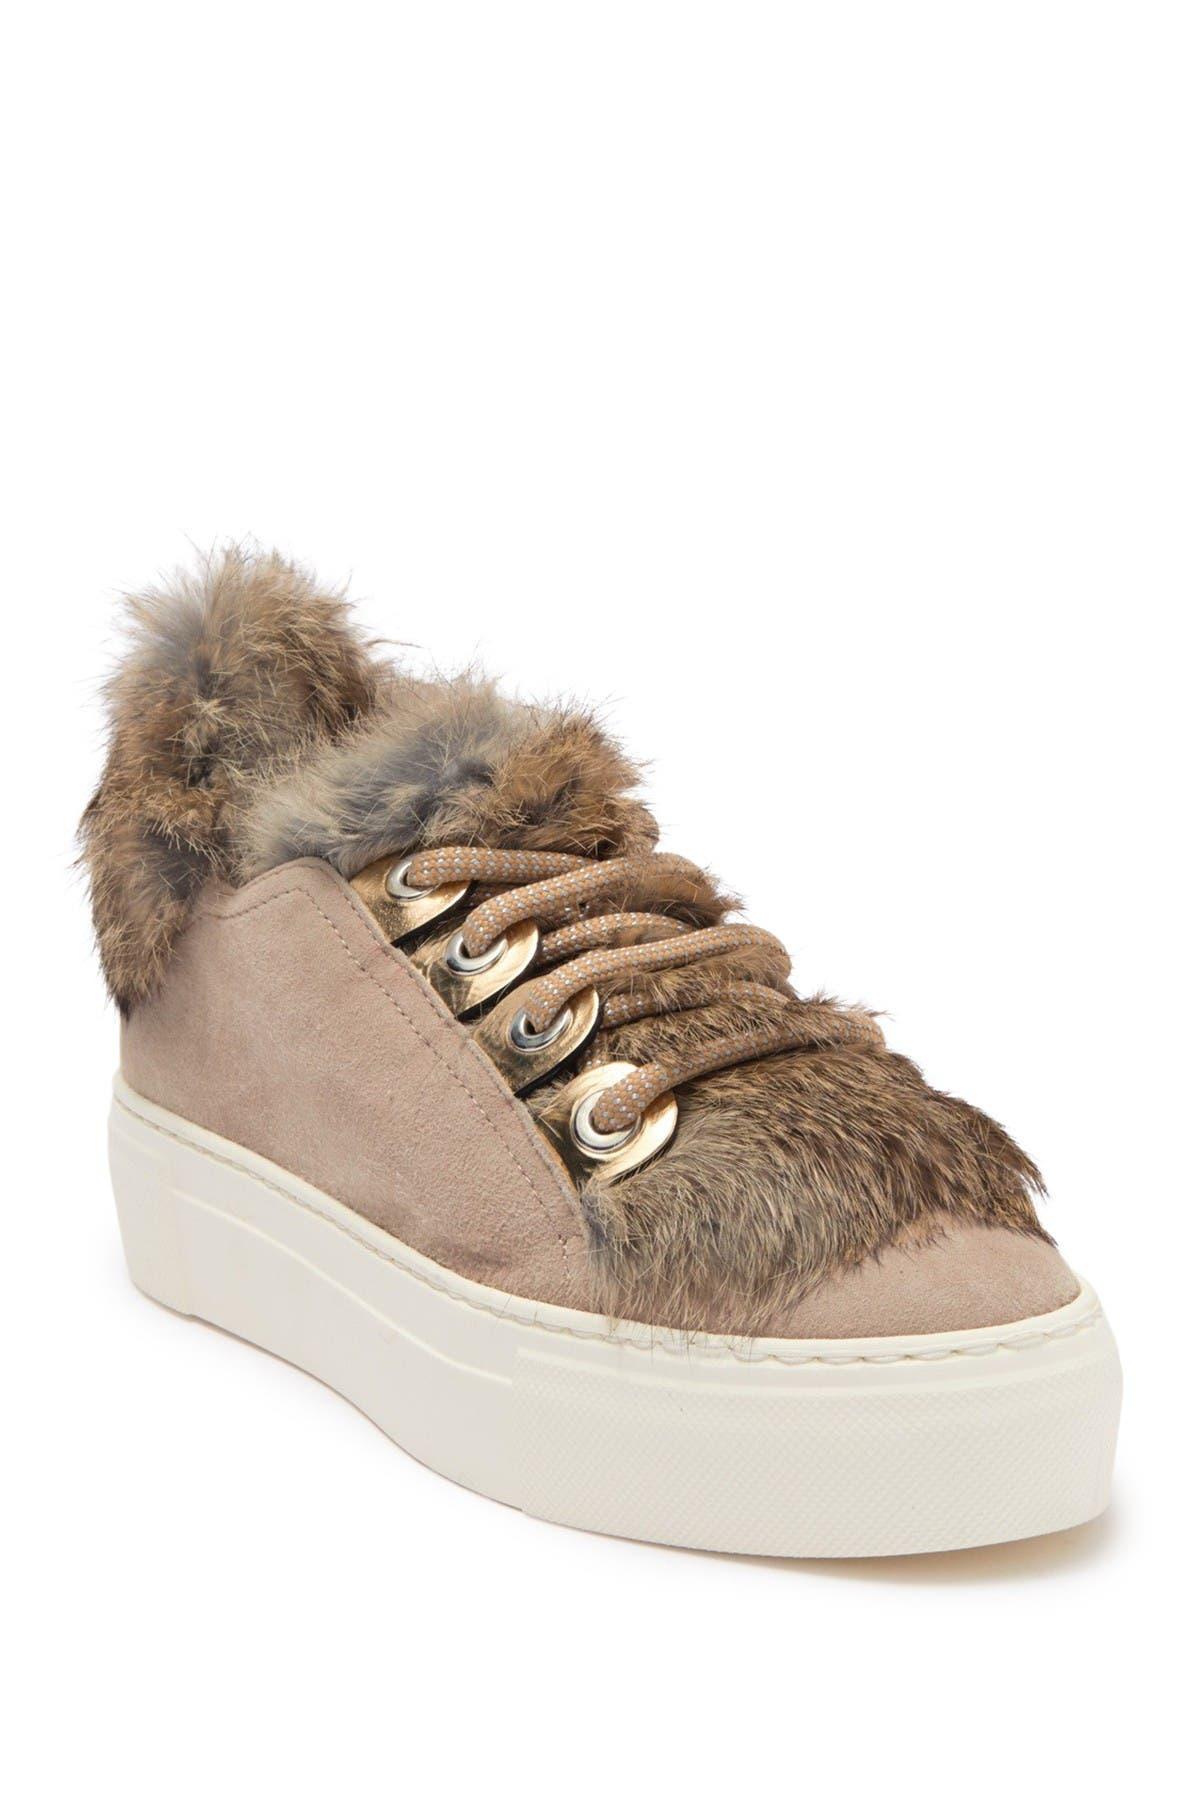 Image of AGL Genuine Sheep Fur Platform Sneaker